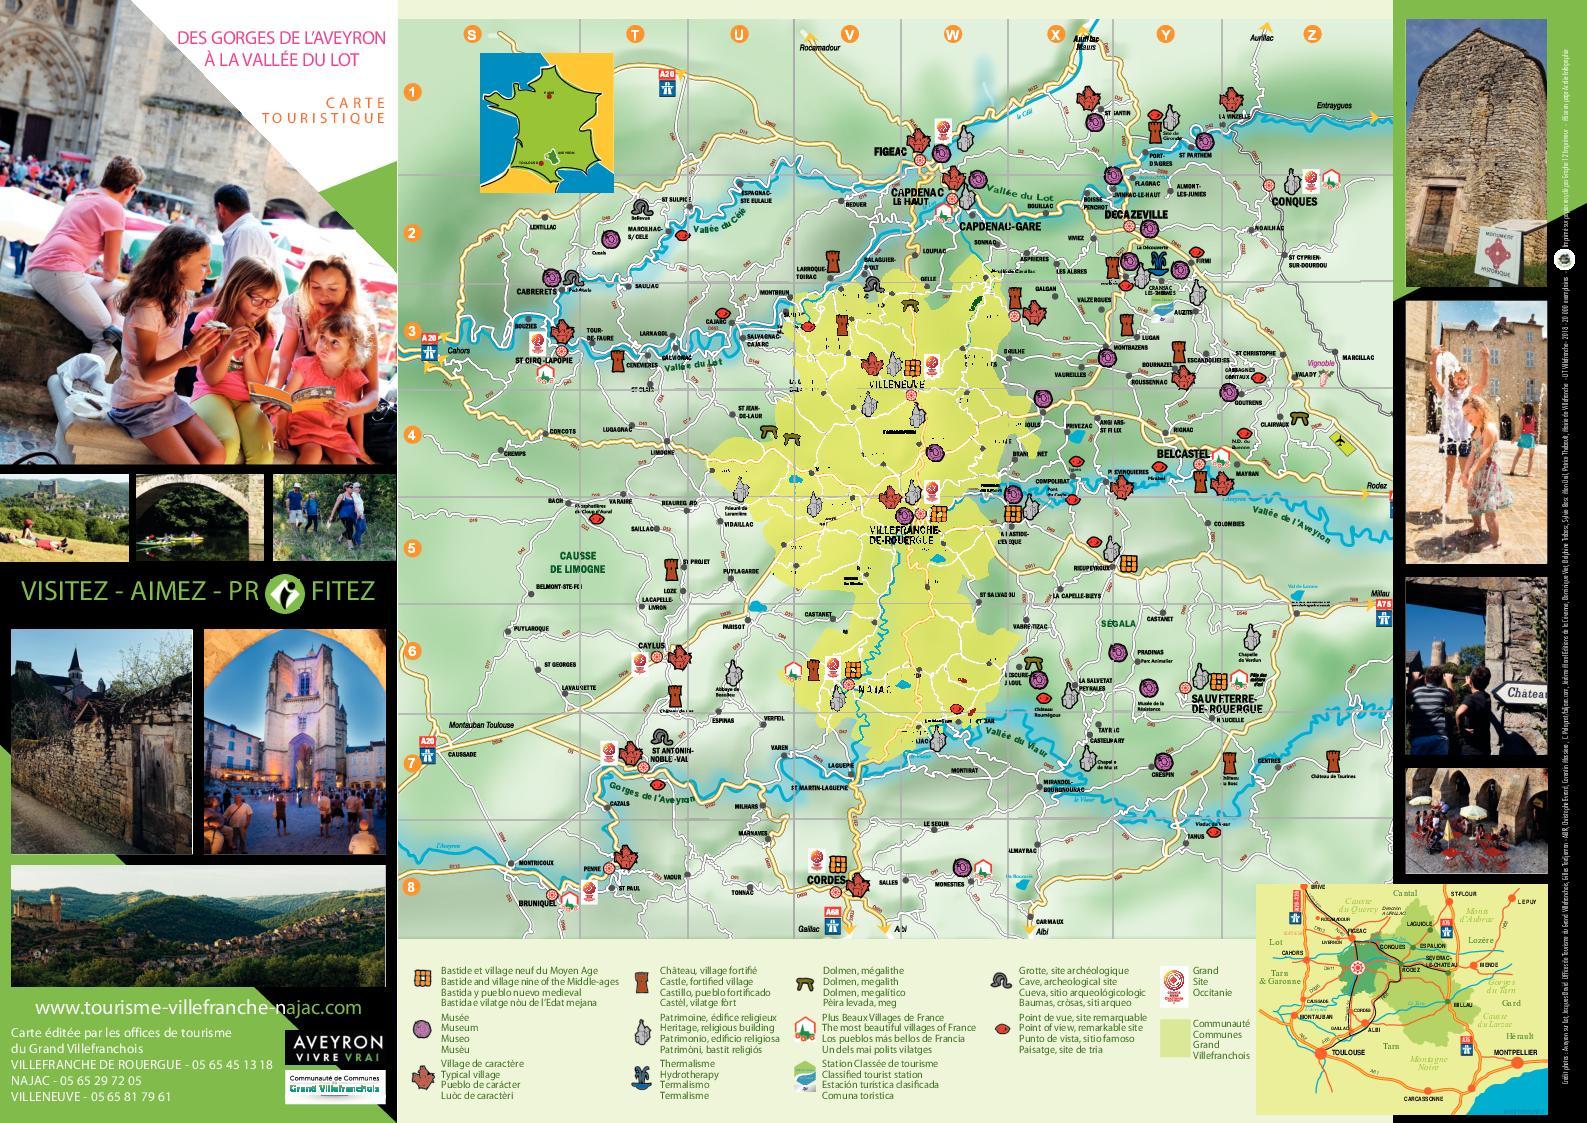 gorges de l aveyron carte 2018 Set Carte Gorges Aveyron   CALAMEO Downloader